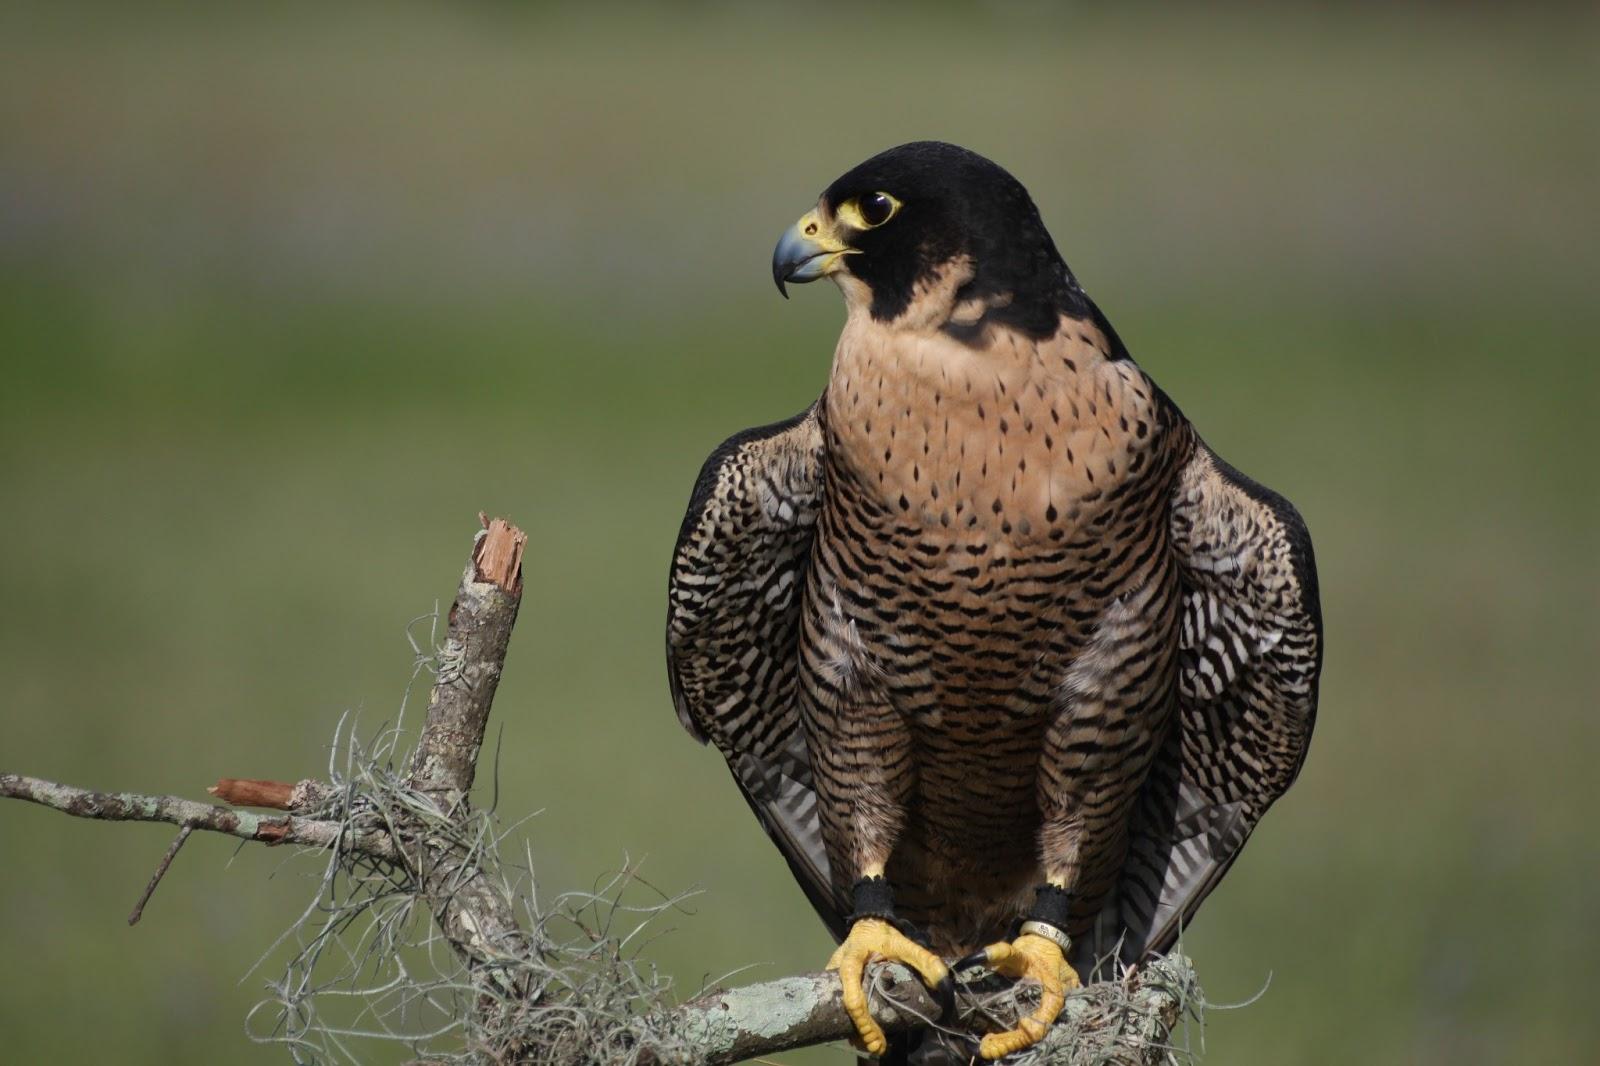 peregrine falcon Peregrine falcon in indiana, including food habits, family life, habitat and population.